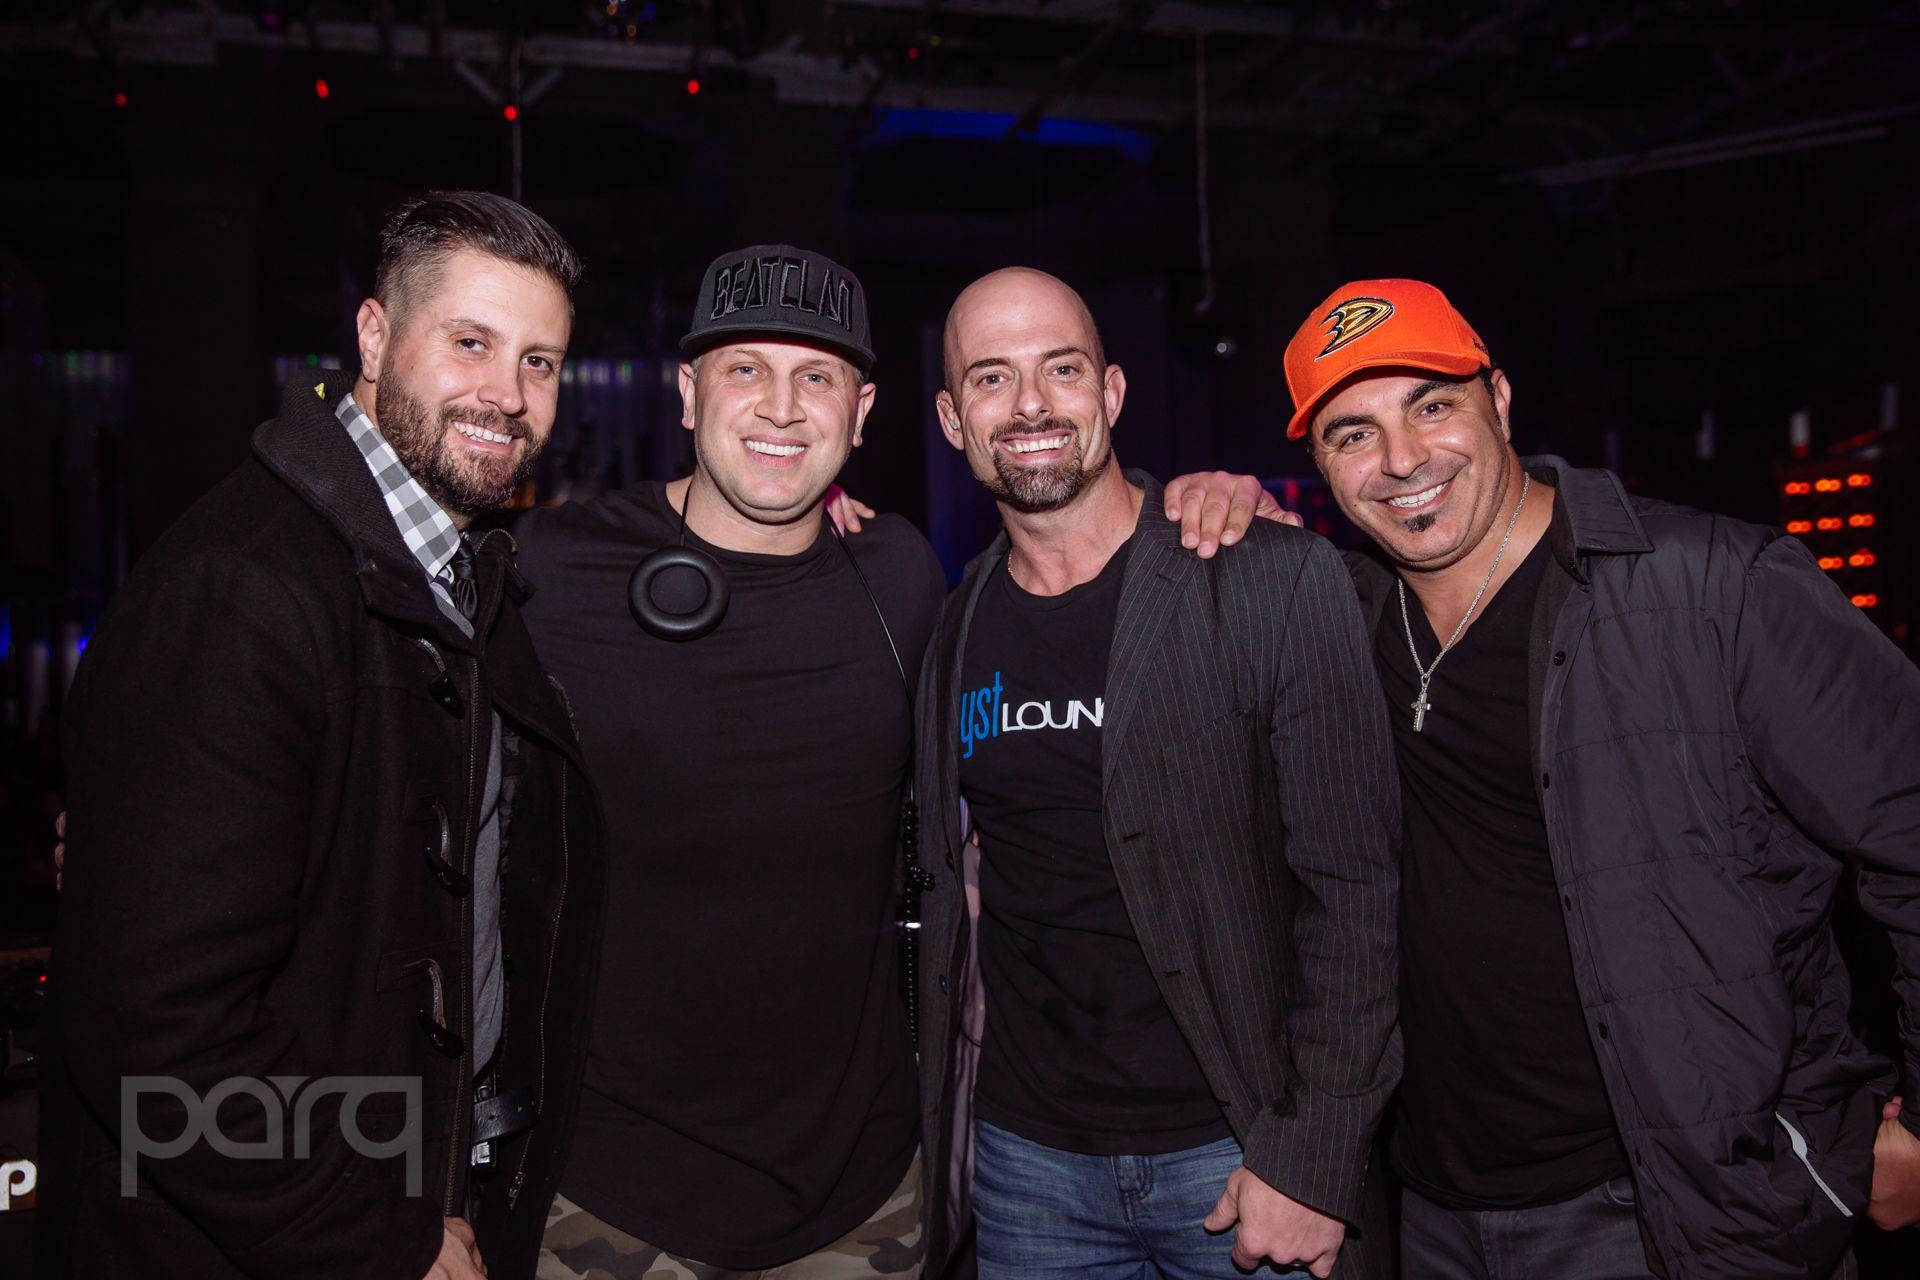 01.19.18 Parq - DJ Hollywood-2.jpg